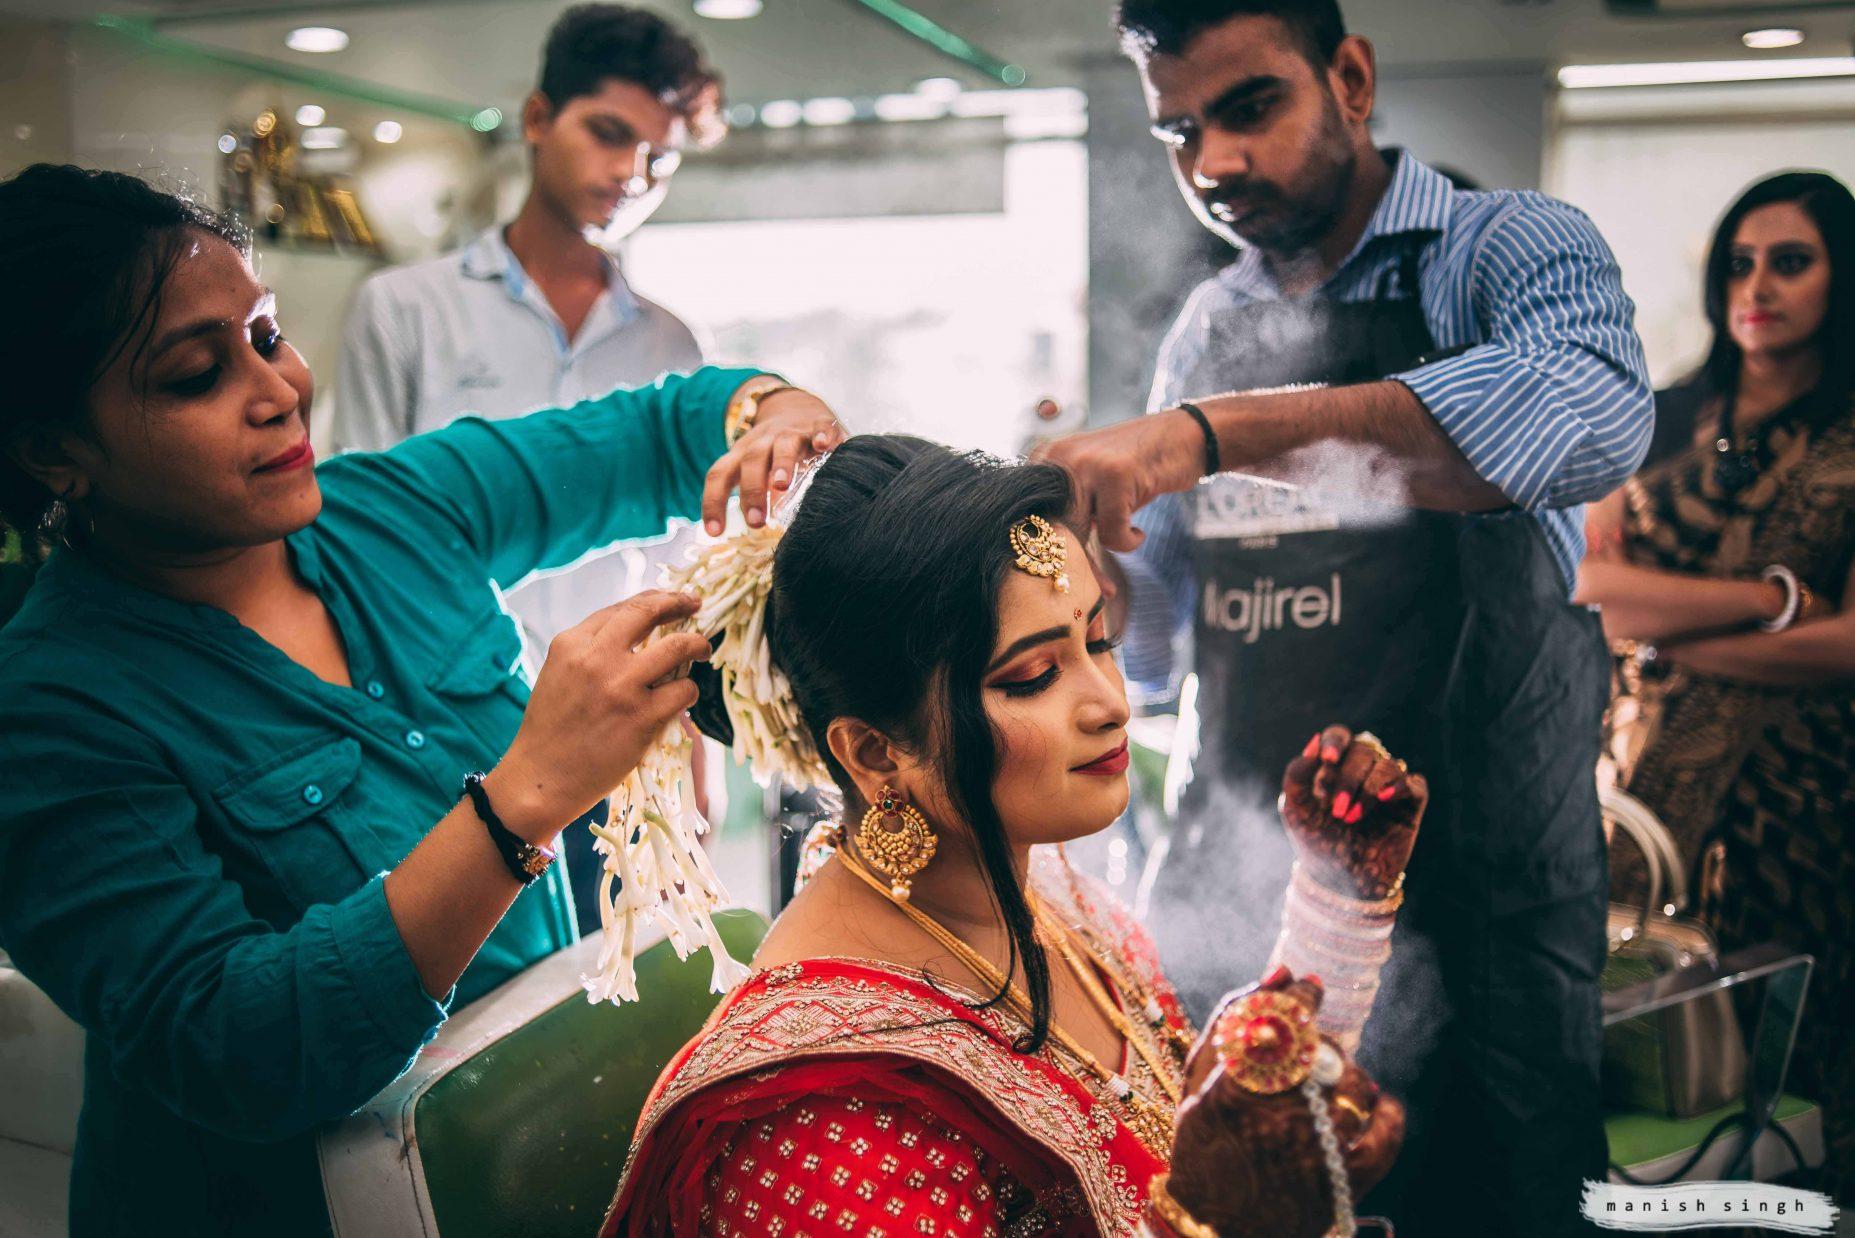 Manish Singh Photography Best wedding photography bhubaneswar bride getting ready